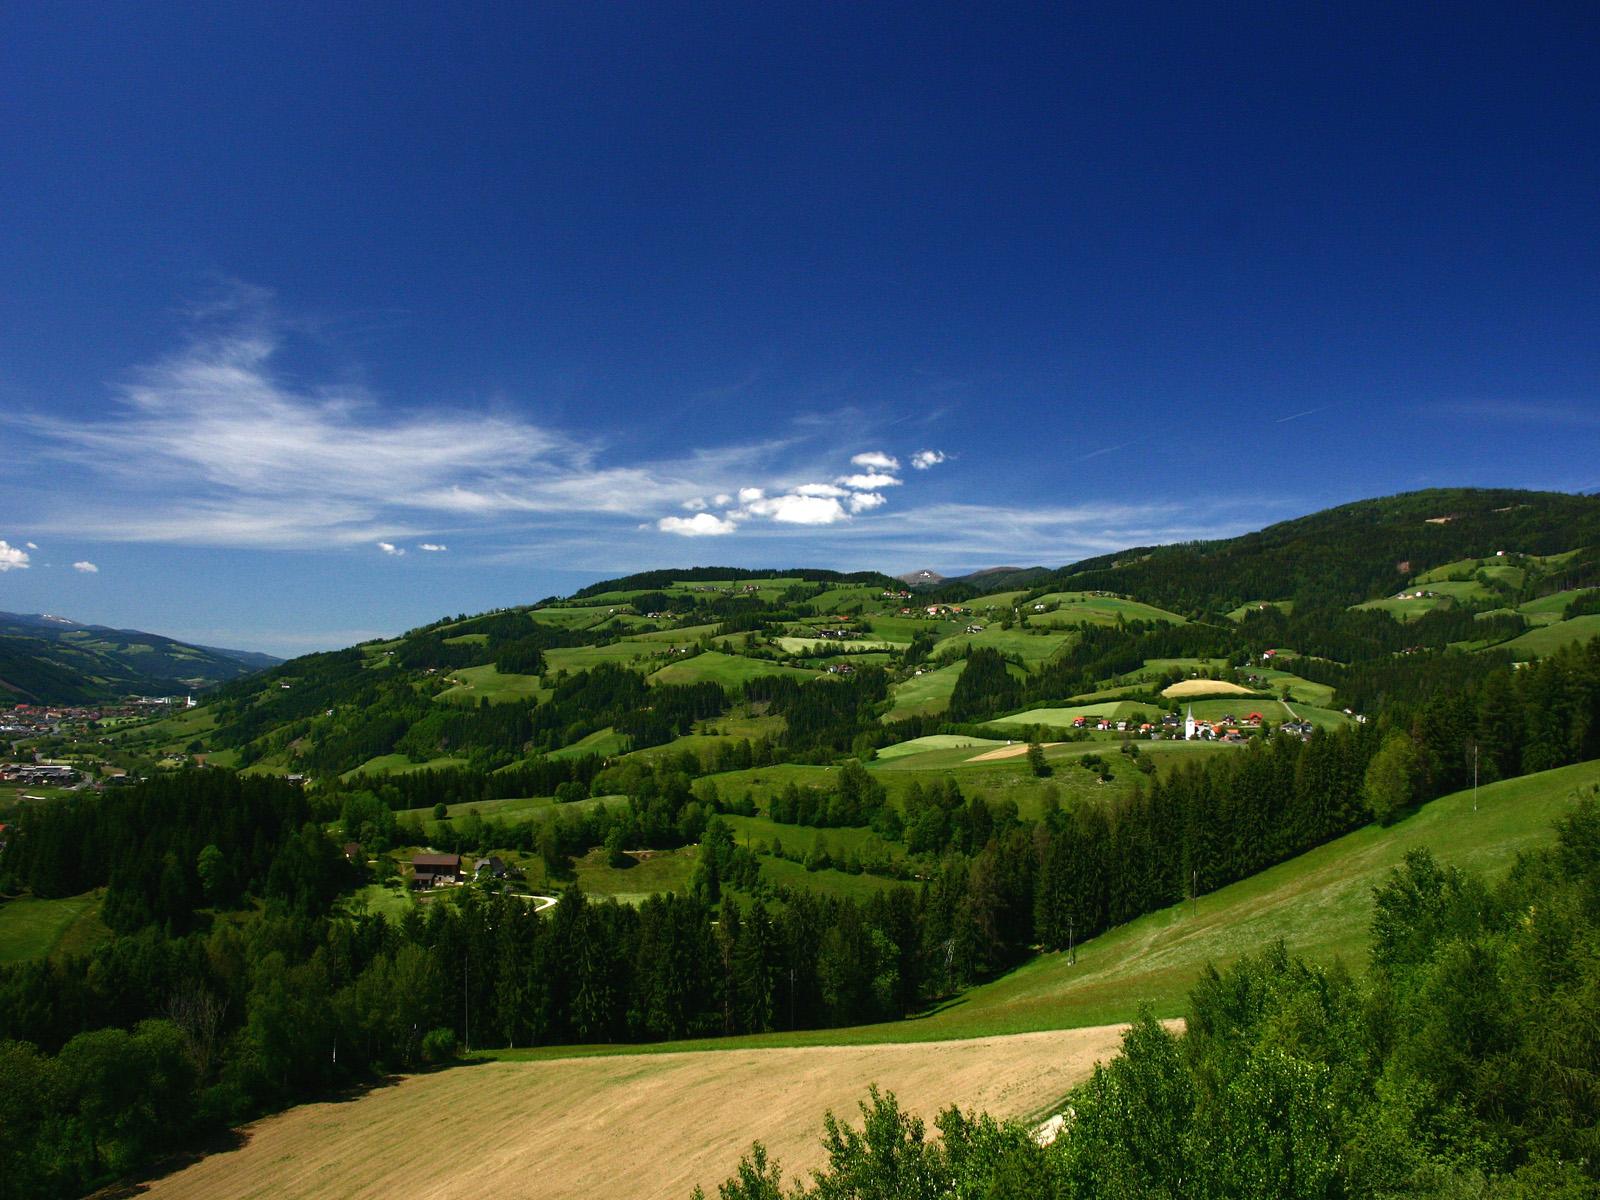 World Visits: Cool Landscape of Austria Amzing Place